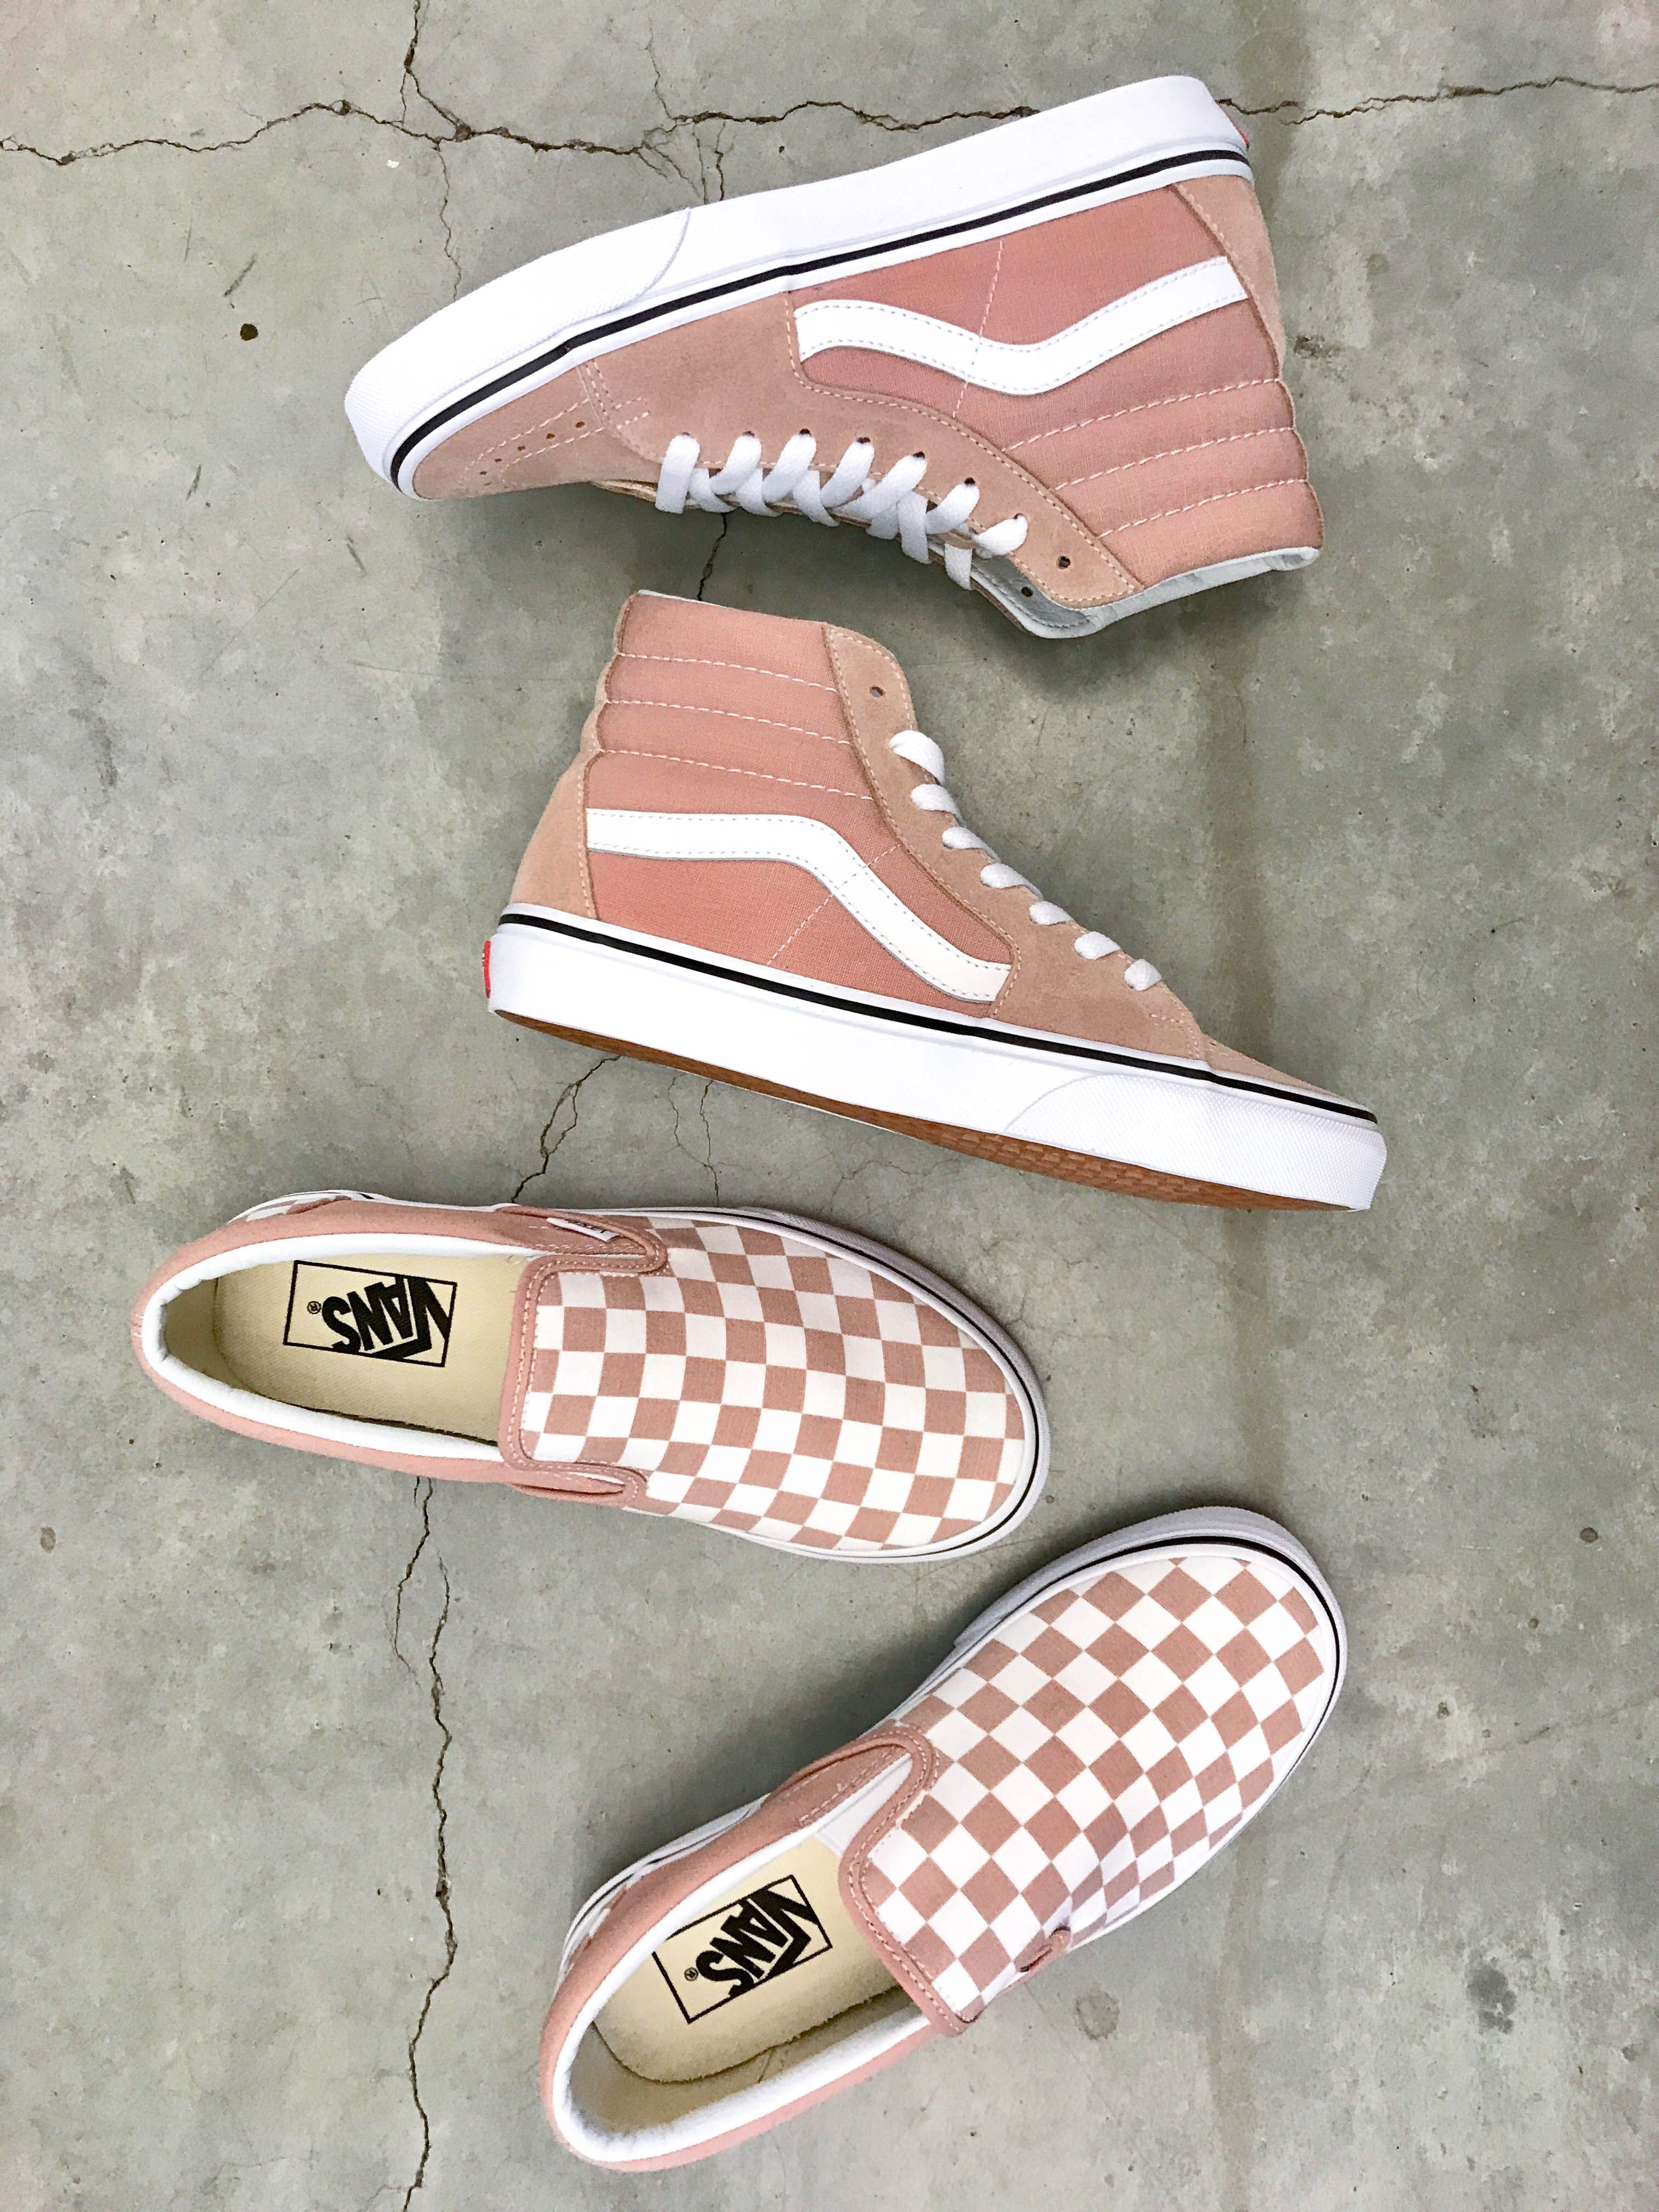 Checkered Board Classic Slip On. I N S T A G R A M  EmilyMohsie. I N S T A  G R A M  EmilyMohsie Pink Vans 1c32d7ed2